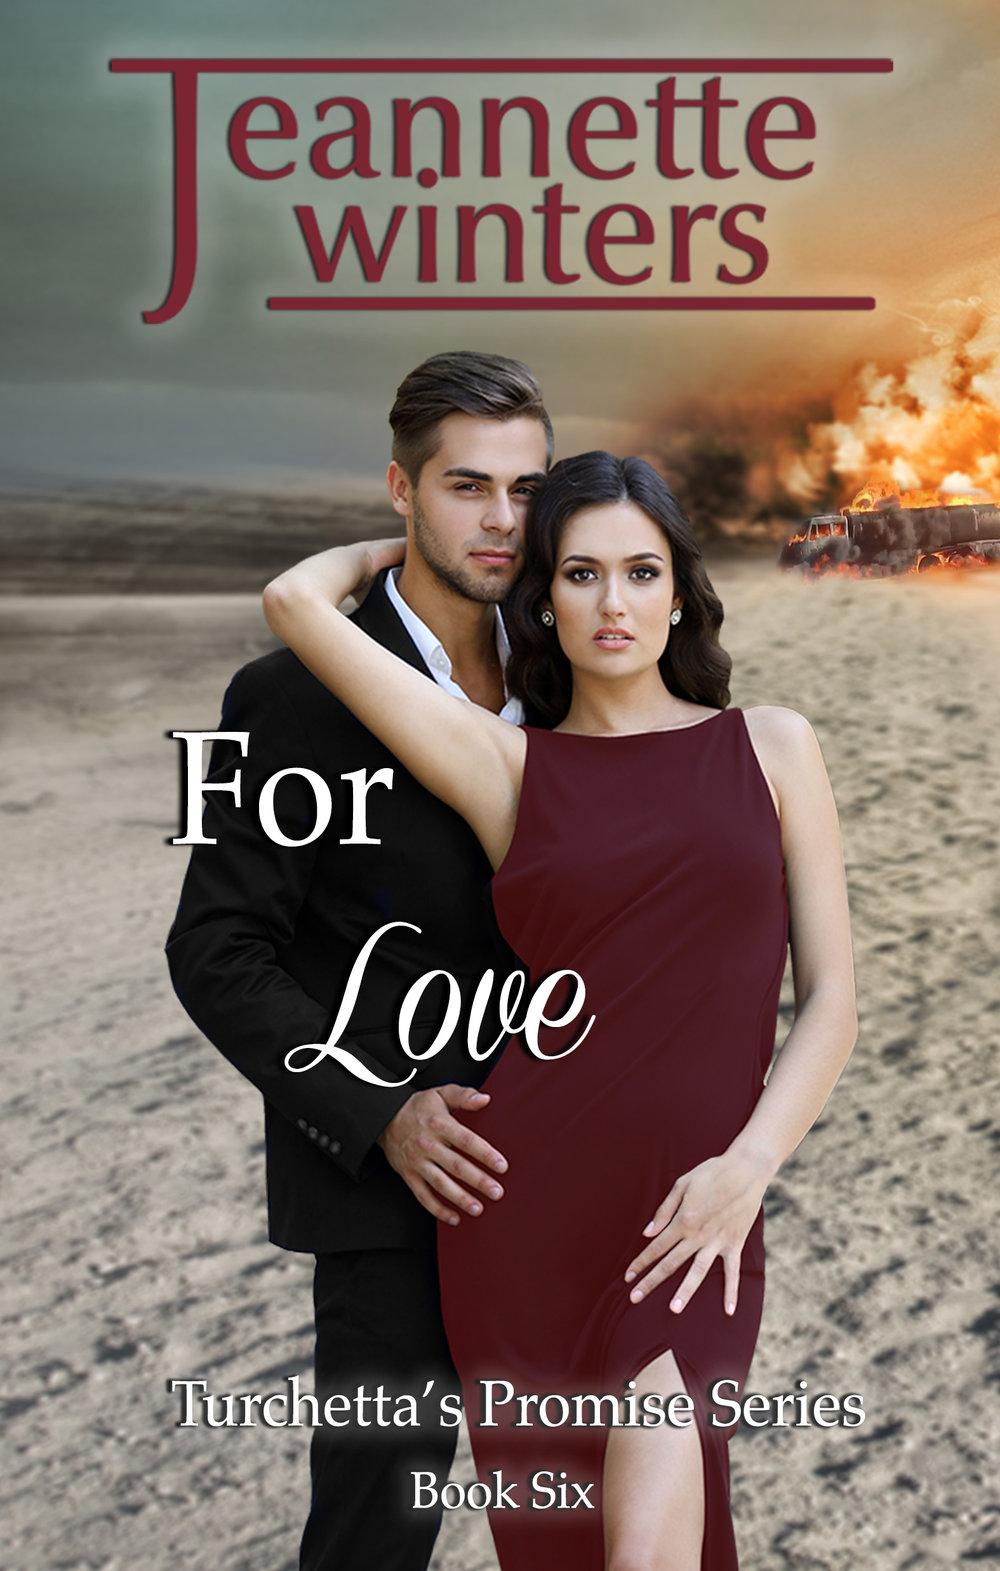 Turchetta's Promise - For Love - Book Six (4).jpg